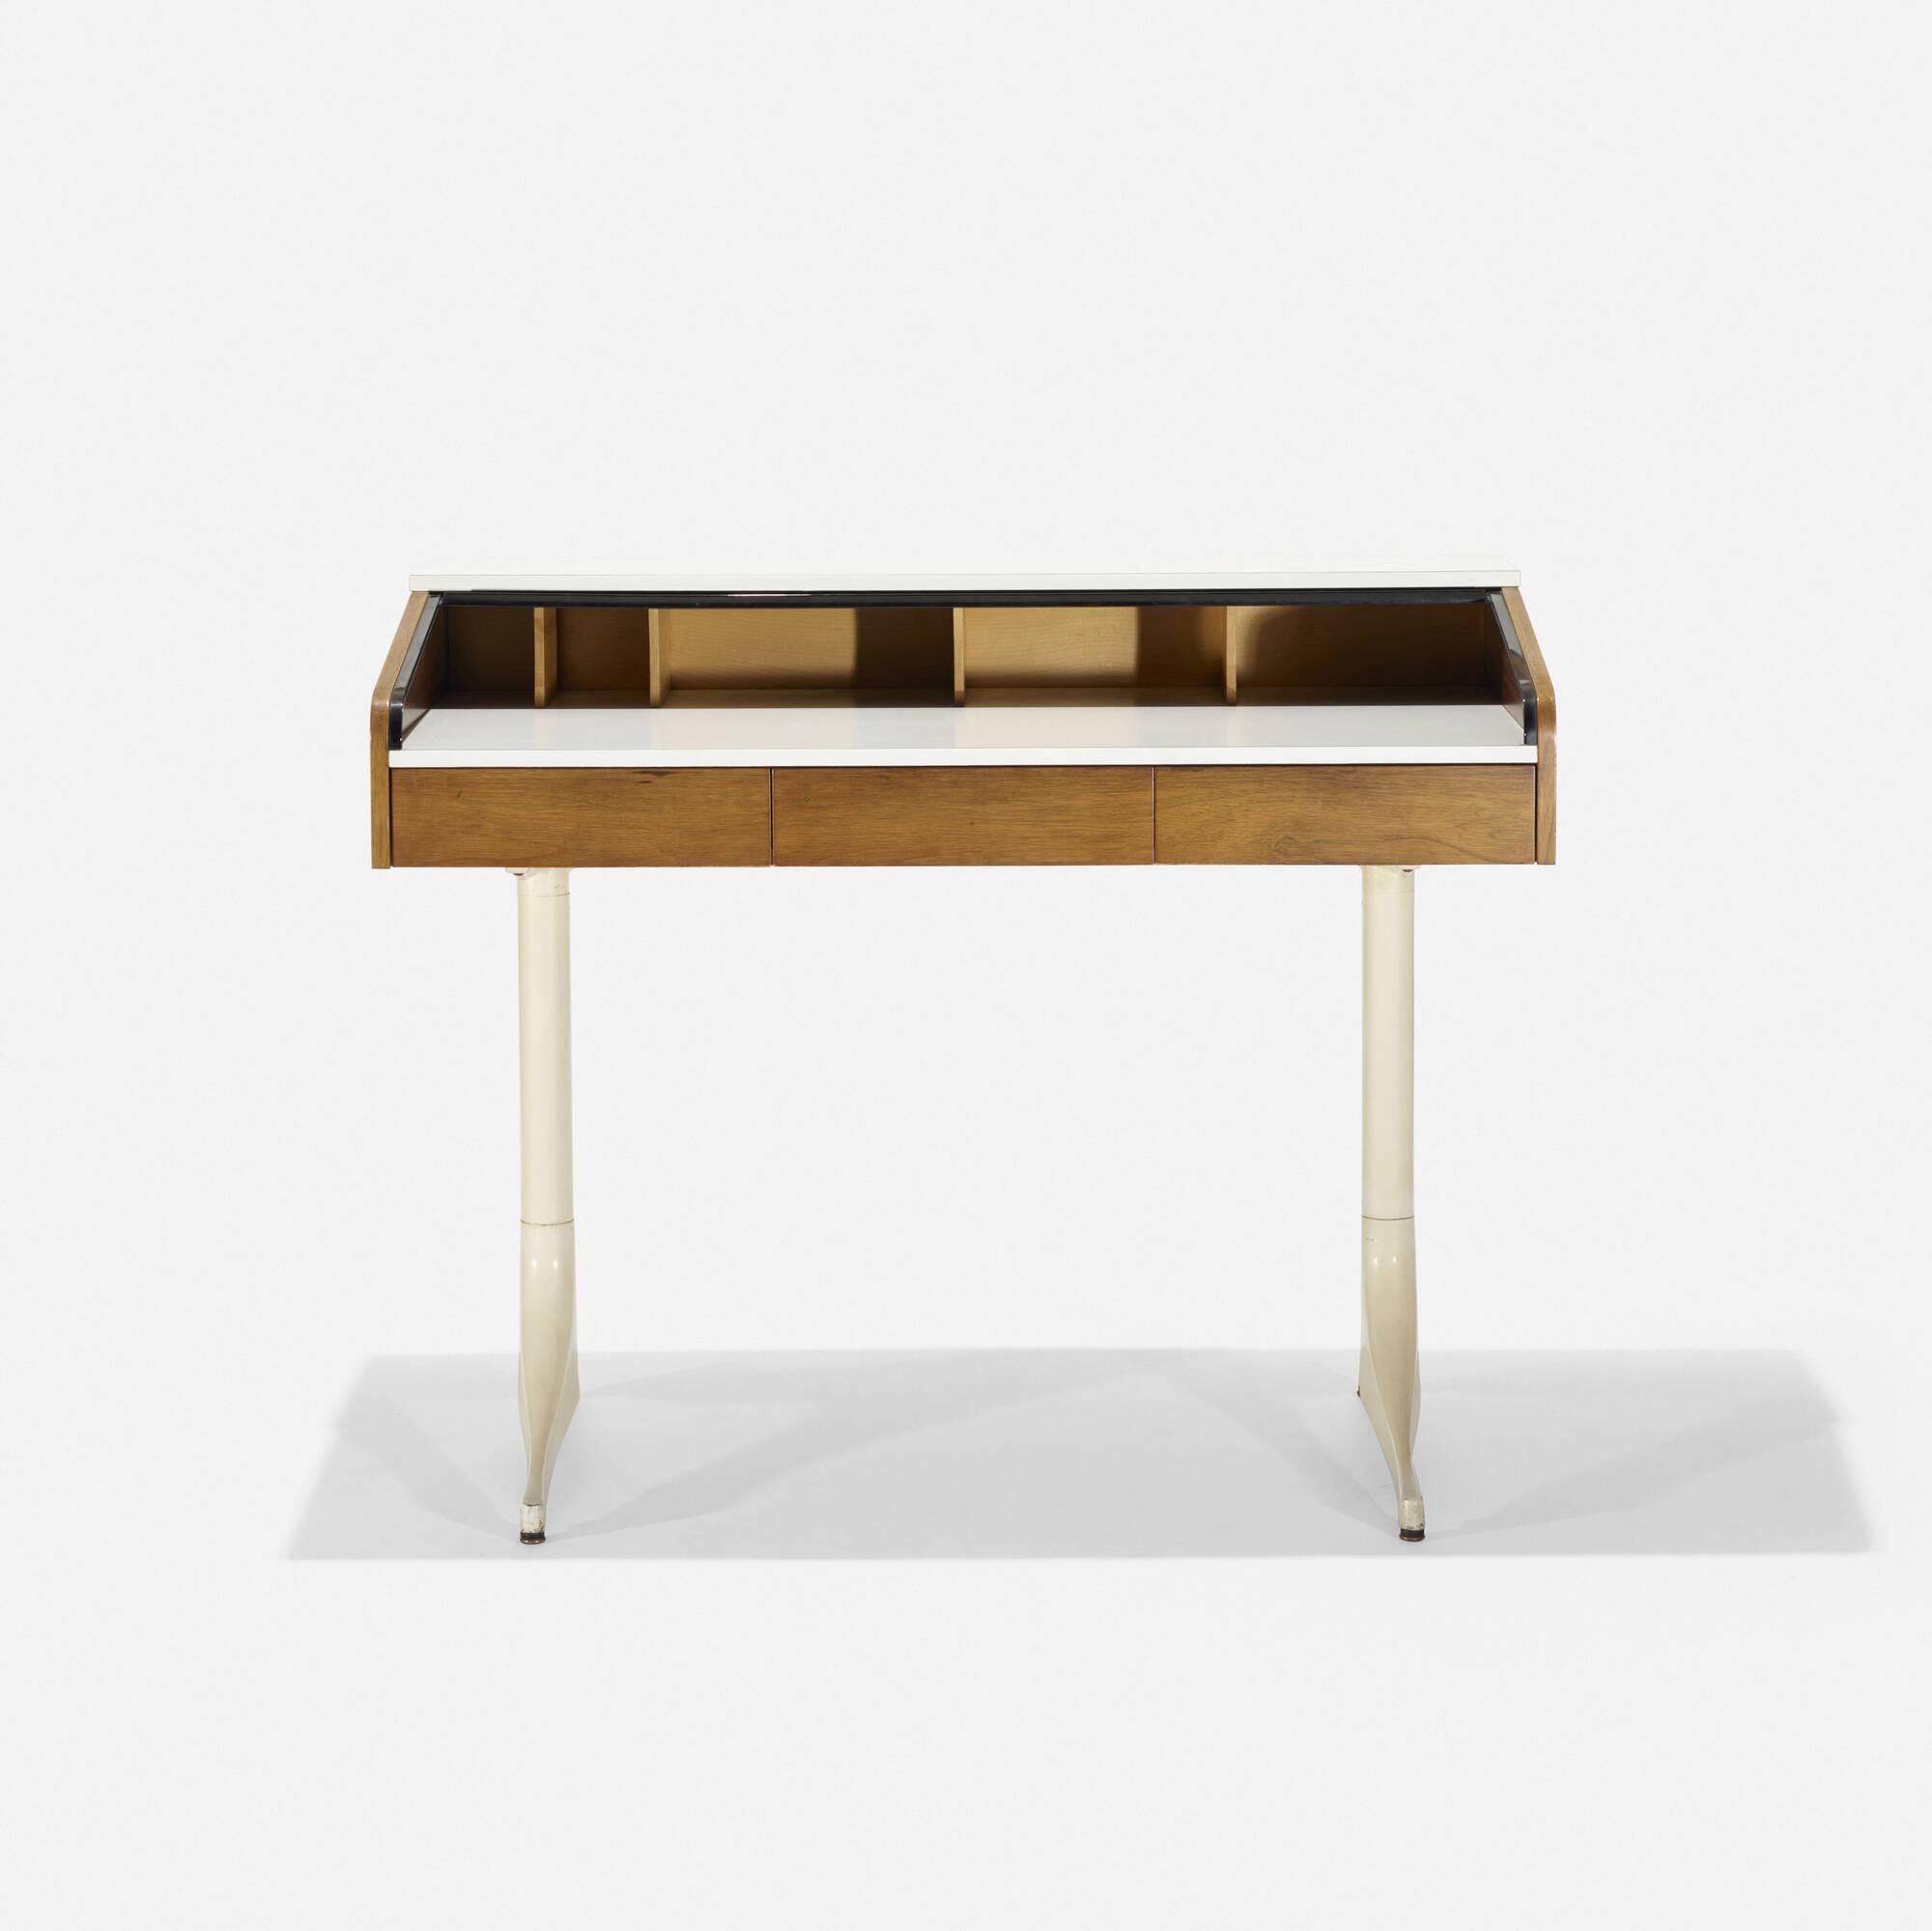 141: George Nelson & Associates / Roll Top desk, model 5496 (2 of 3)